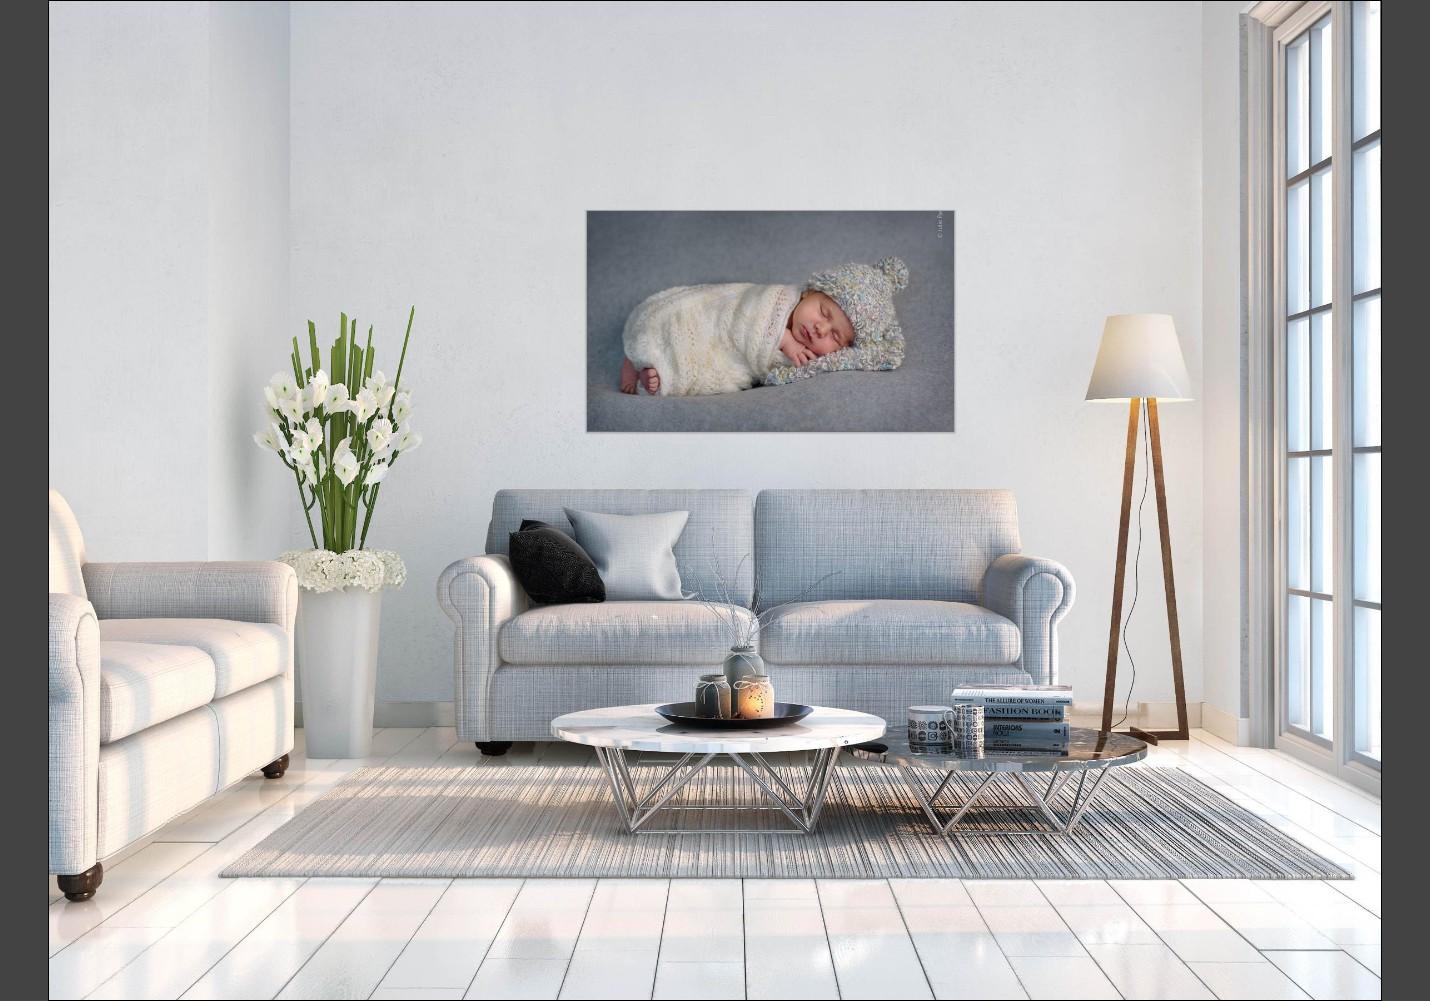 Room view of a newborn portrait